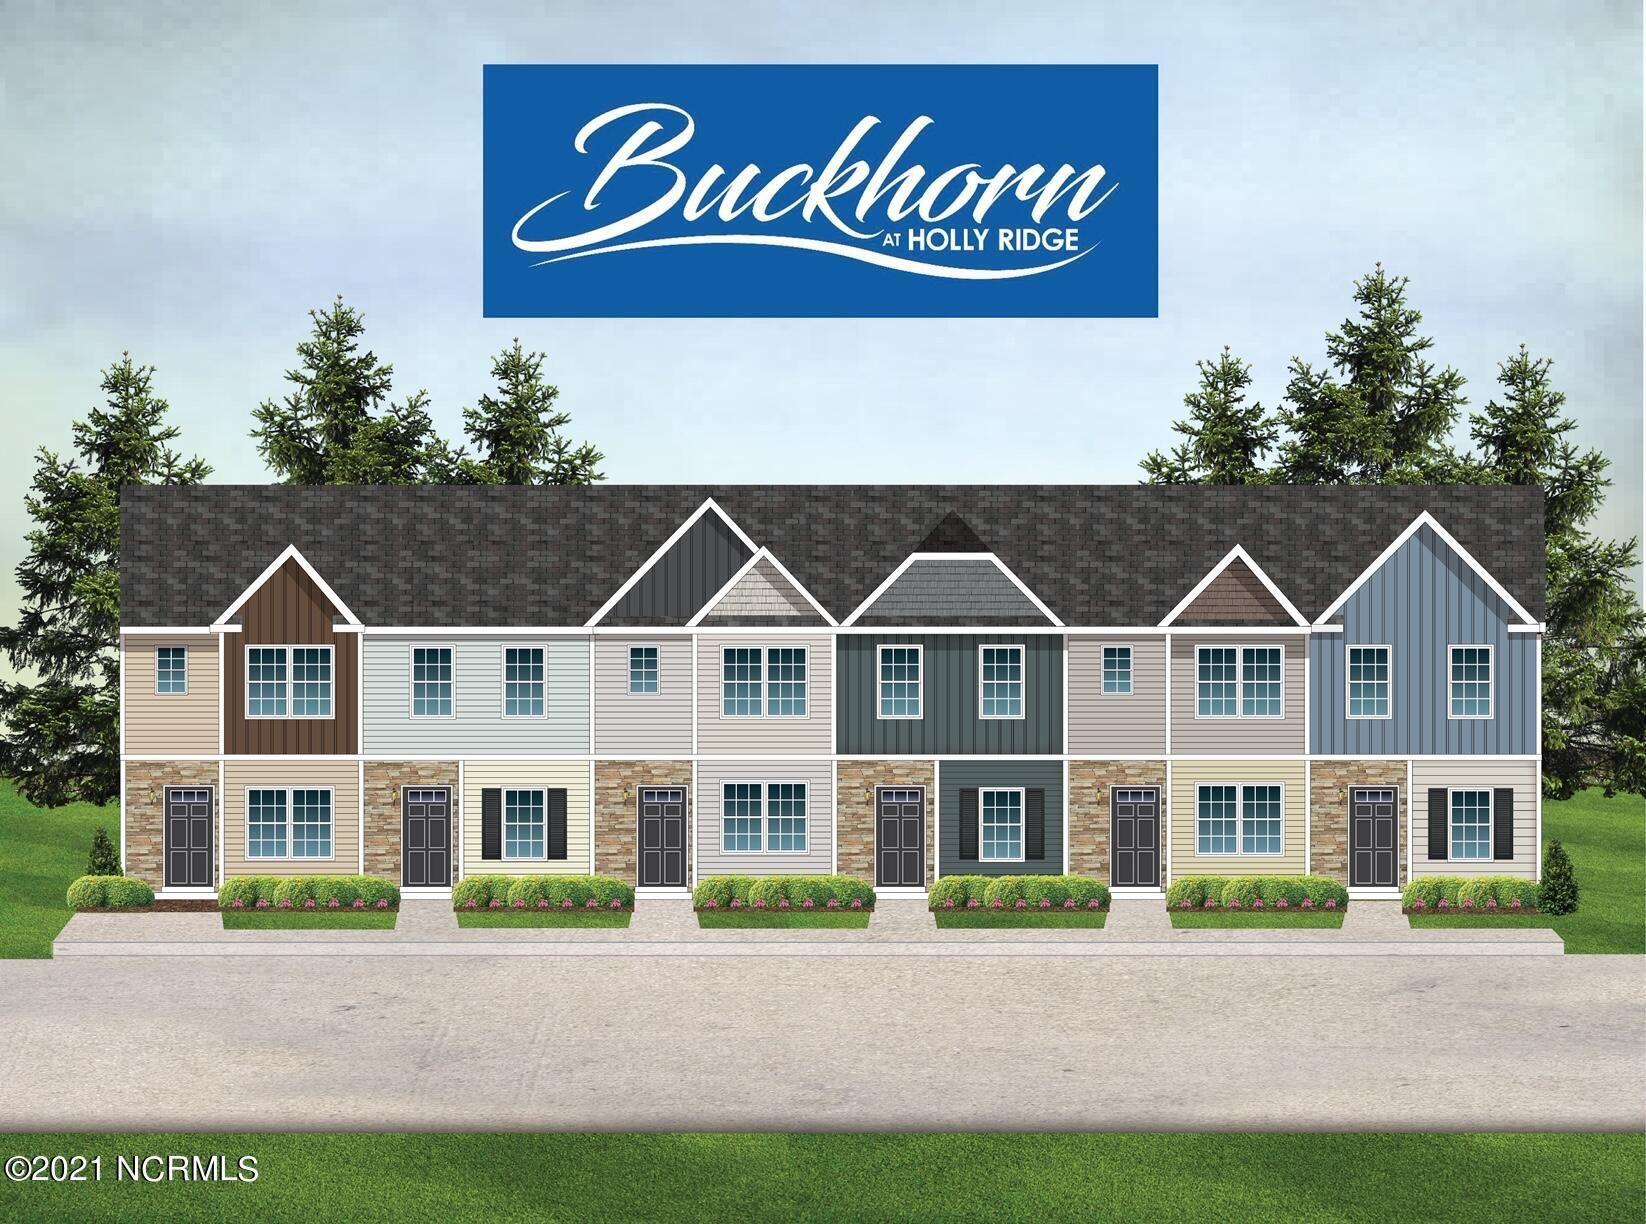 Photo of 179 Buckhorn Ave, Holly Ridge, NC 28445 (MLS # 100294380)